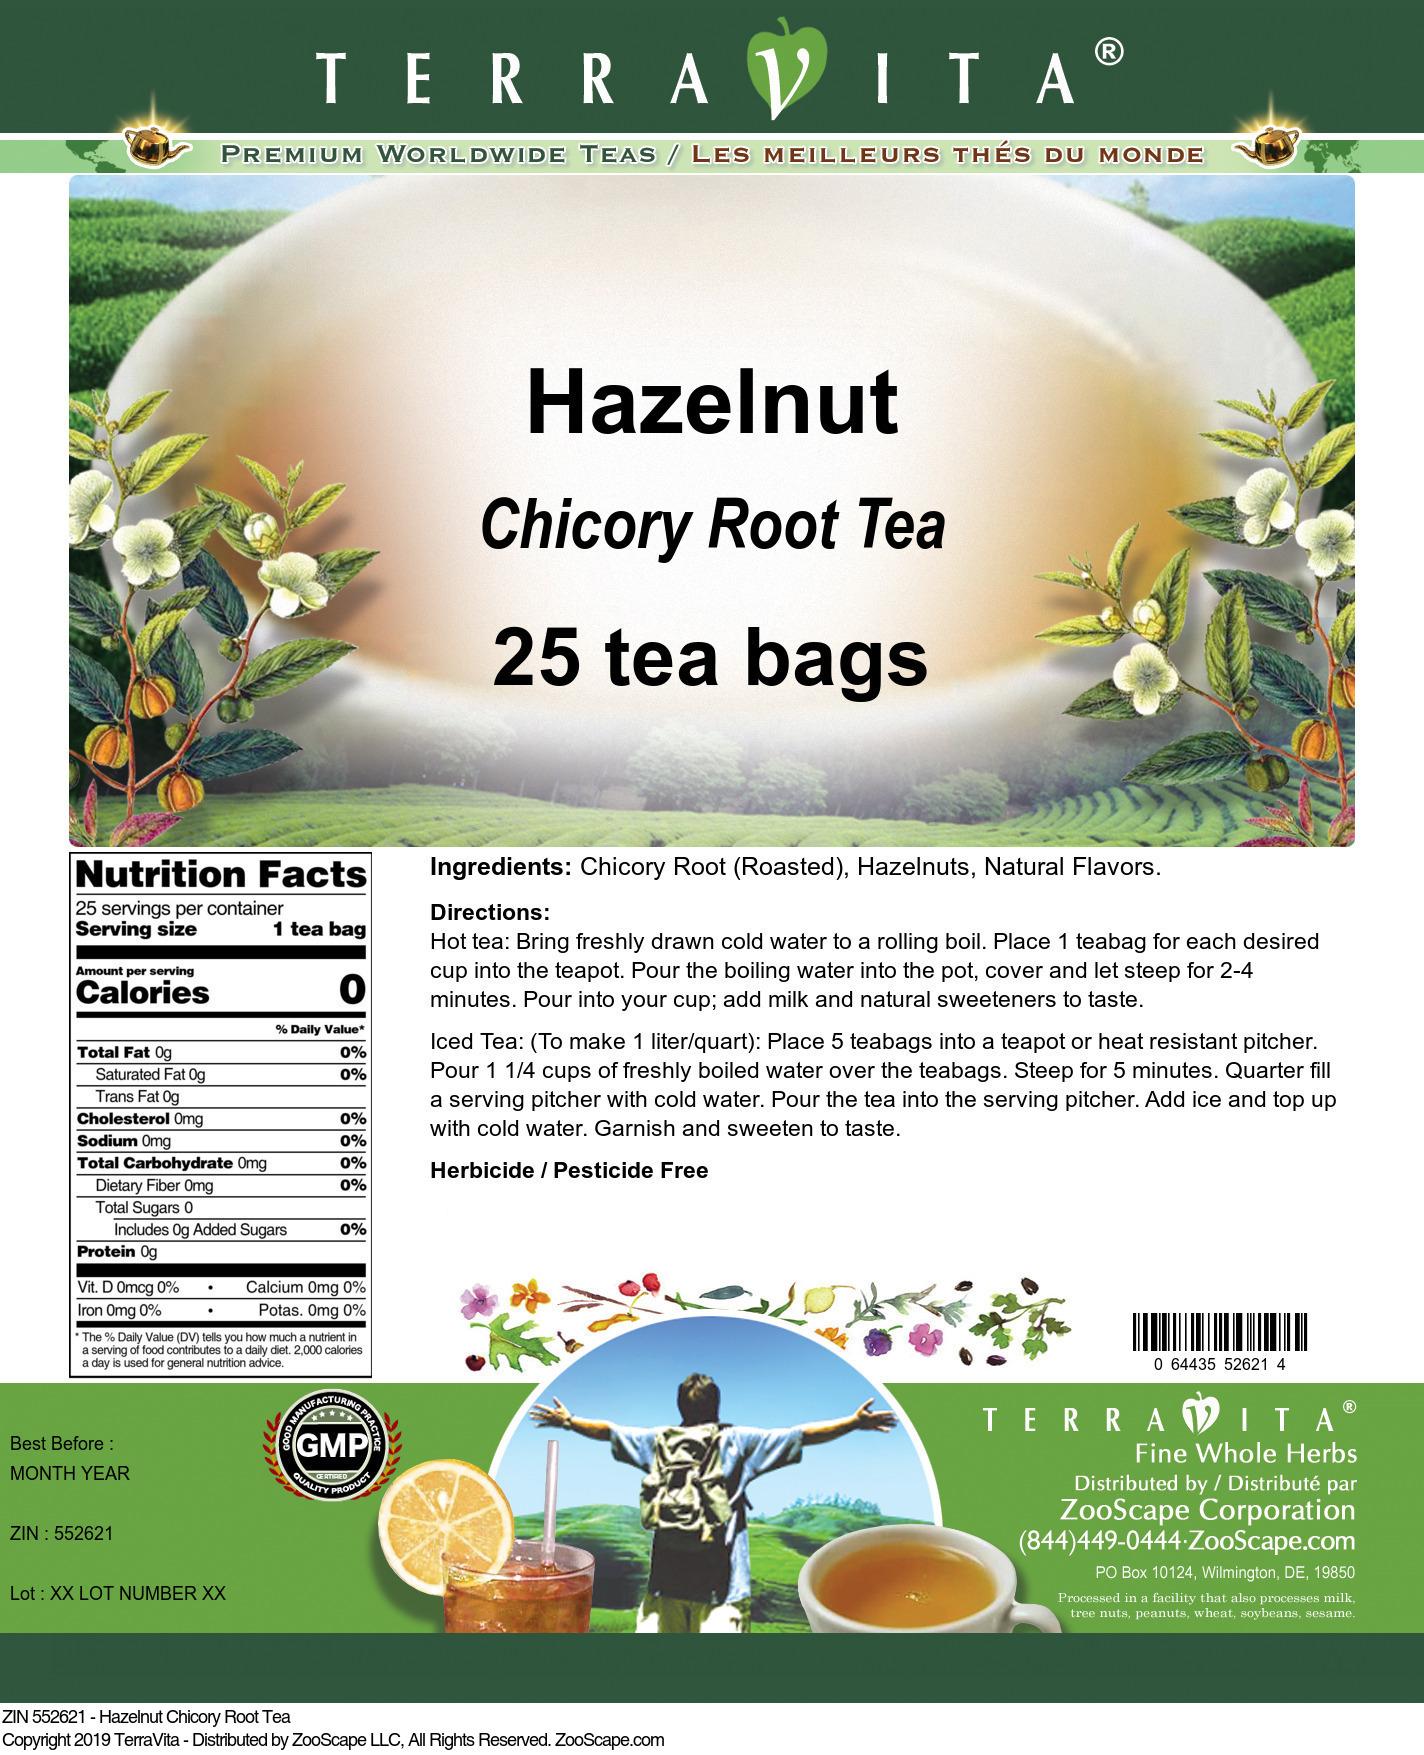 Hazelnut Chicory Root Tea